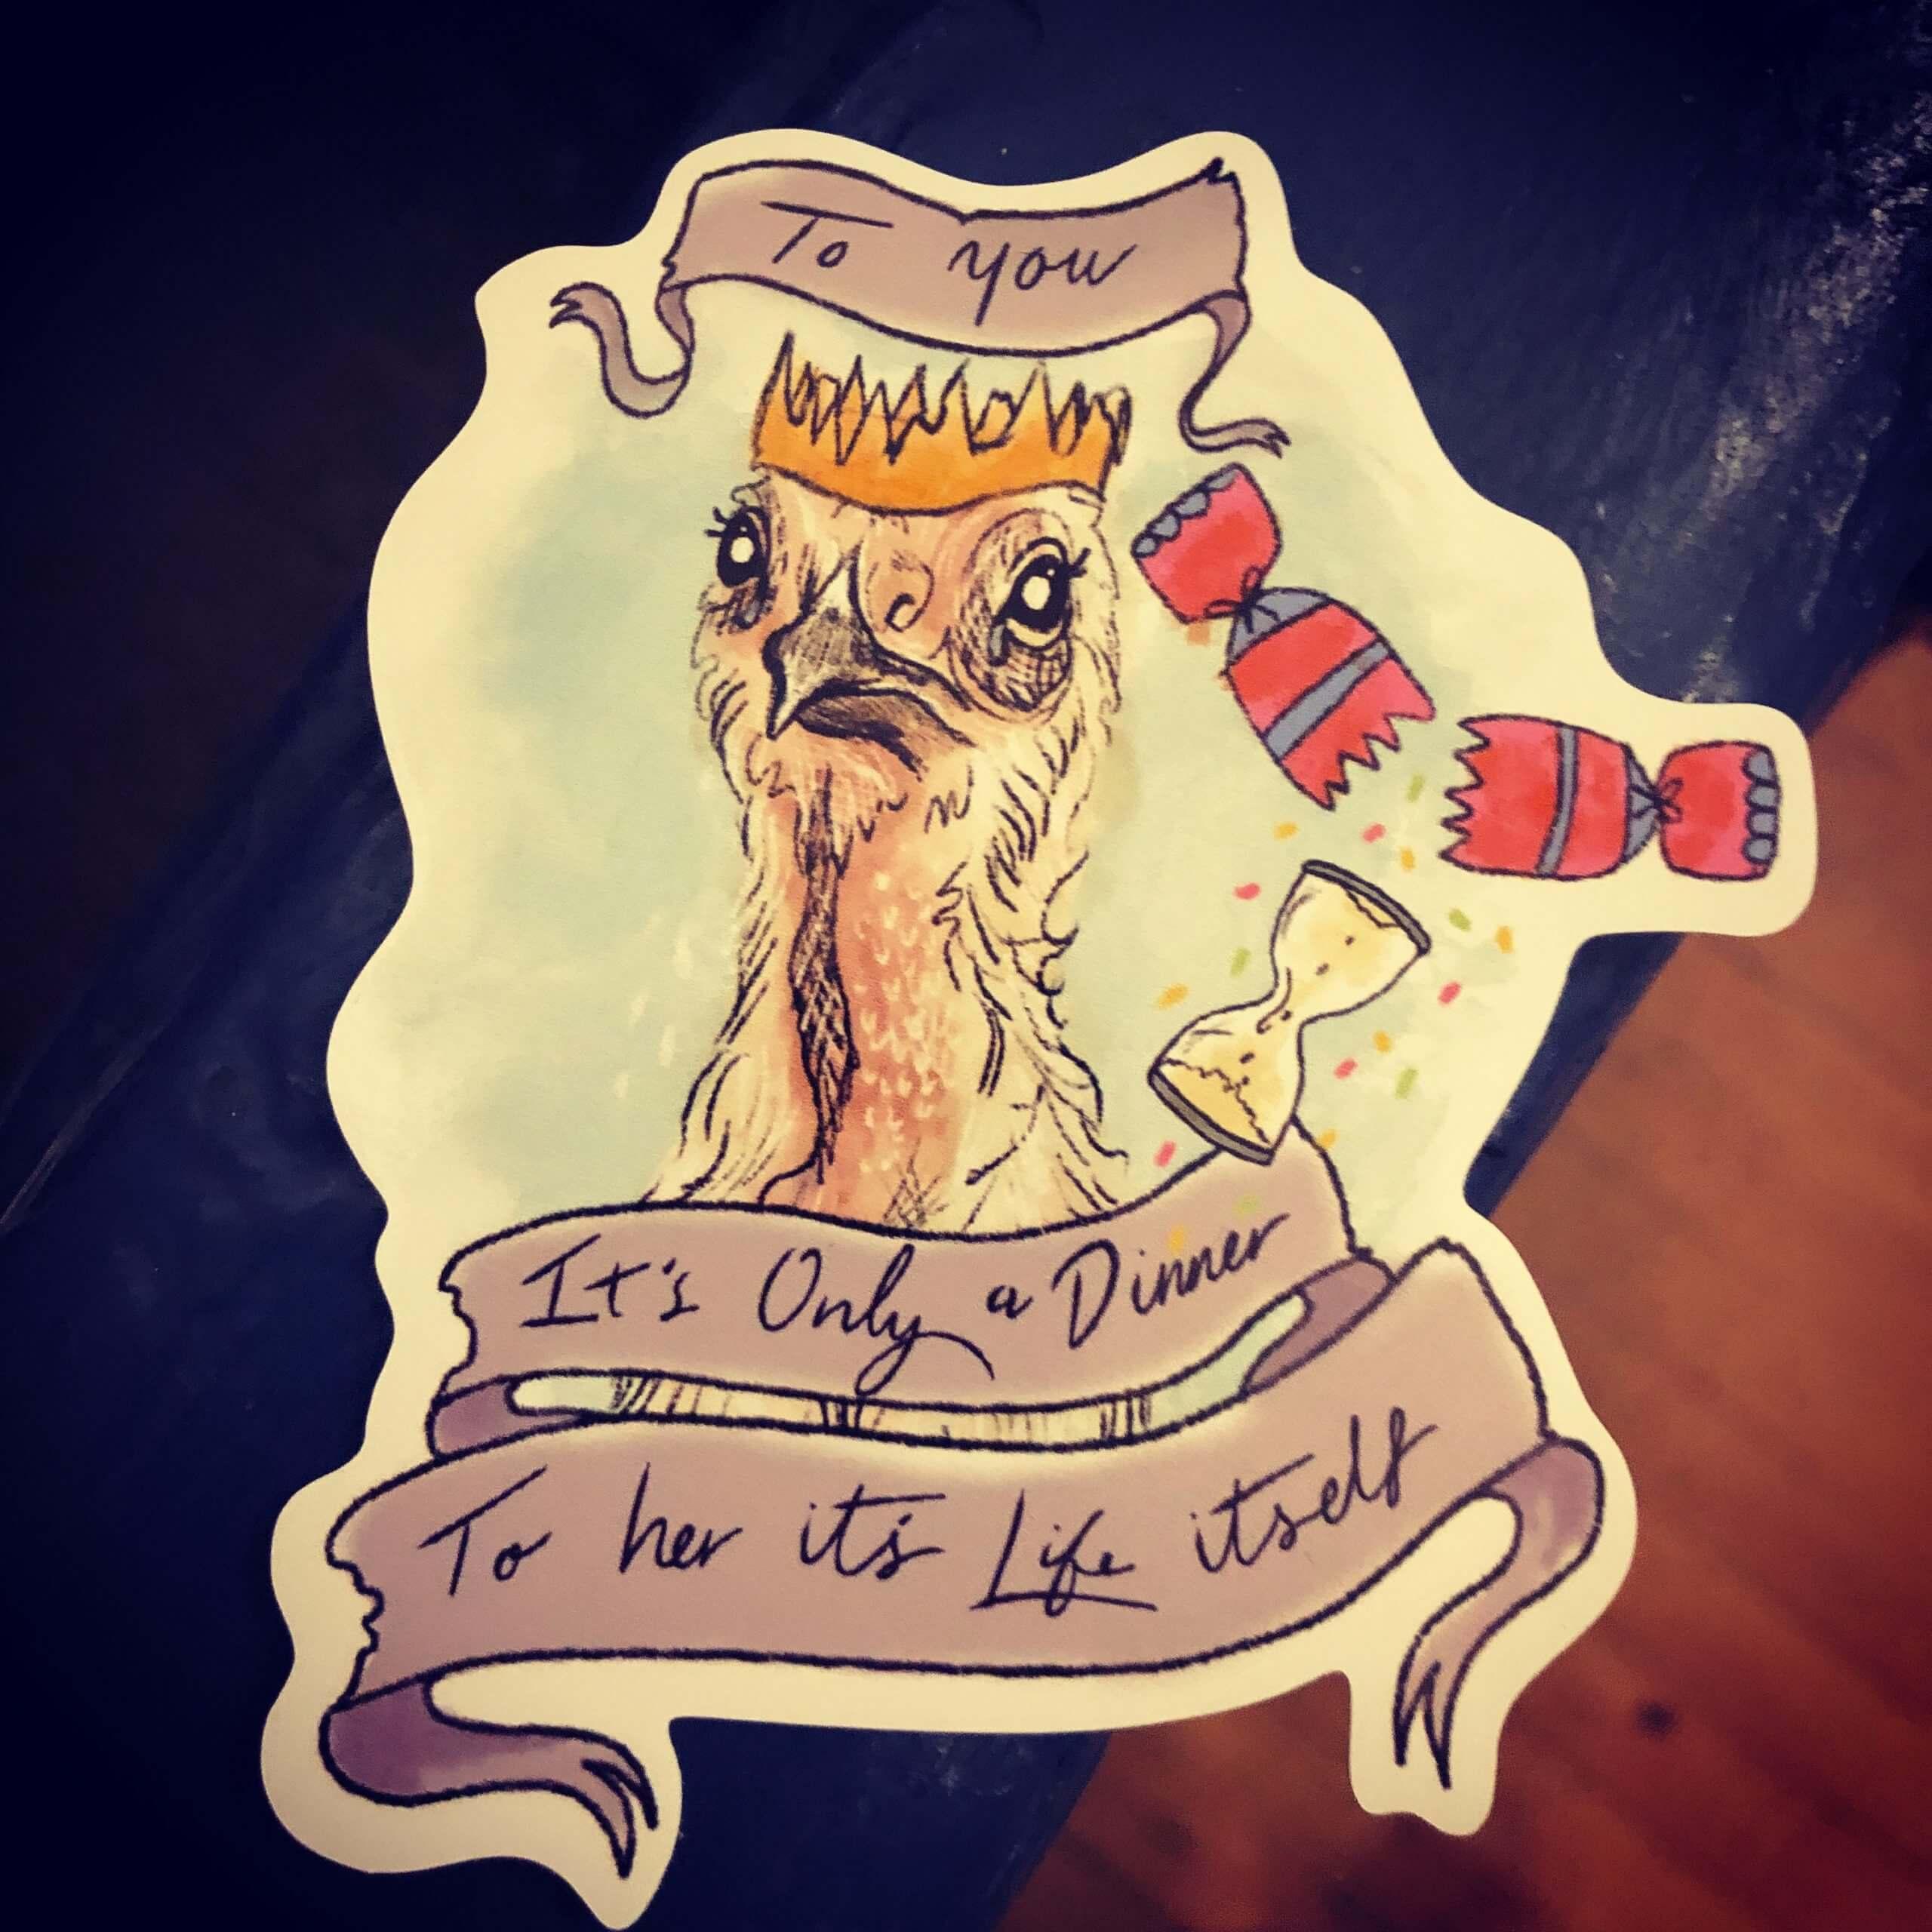 Vinyl Vegan Sticker - Life itself!